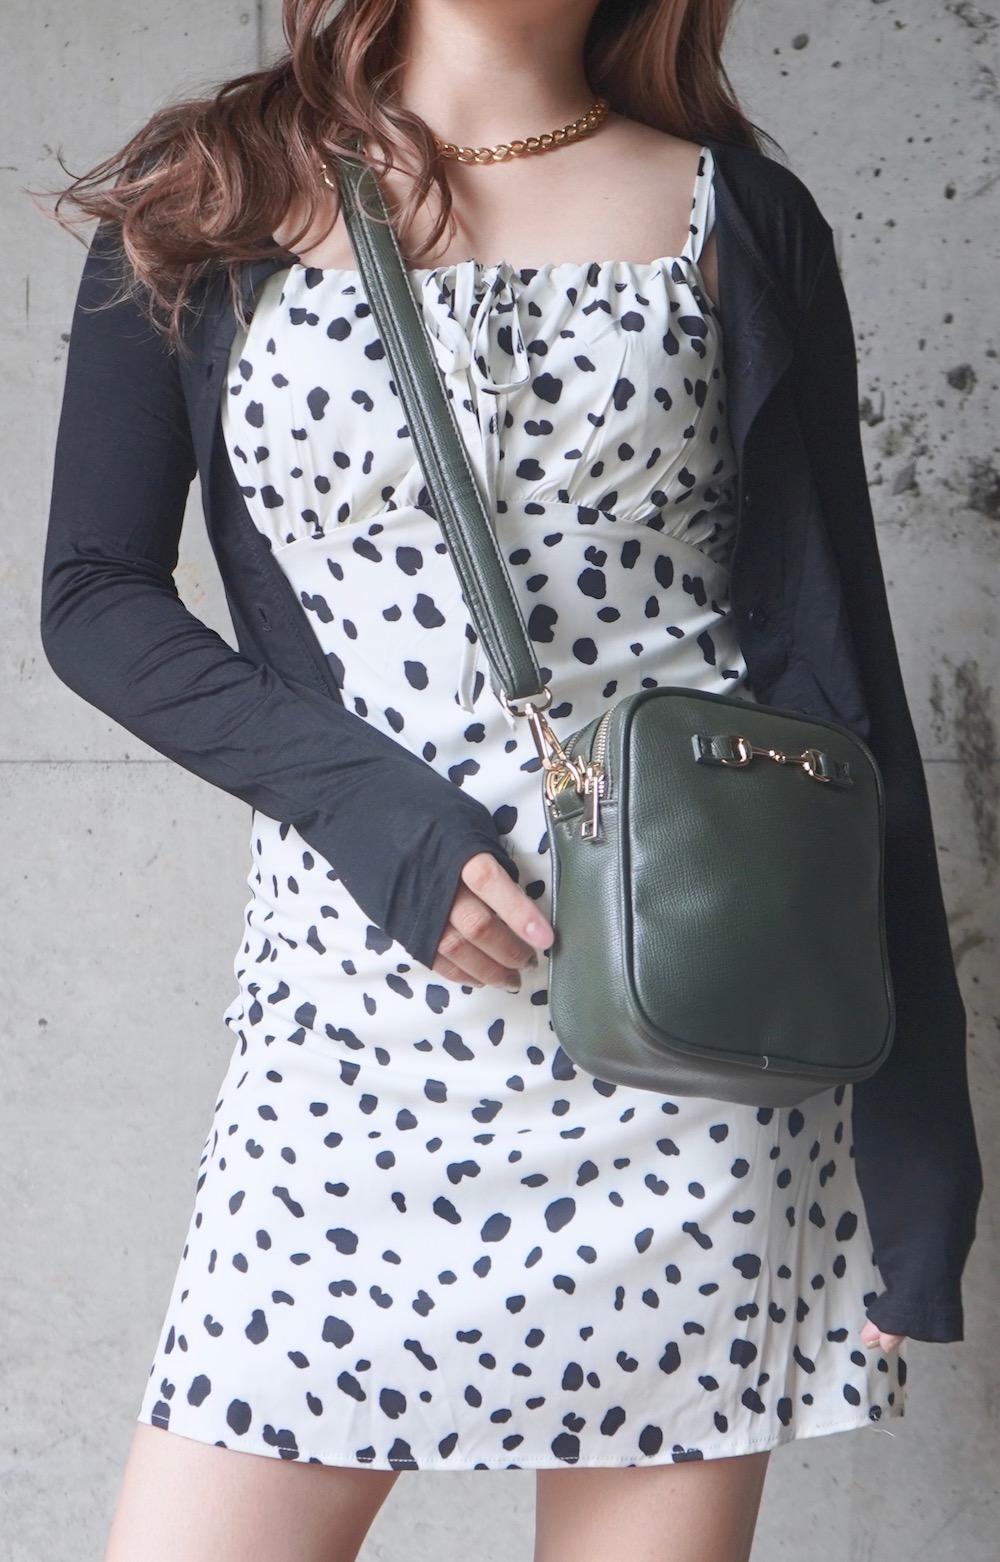 Dalmatian Cami-Onepiece (white)